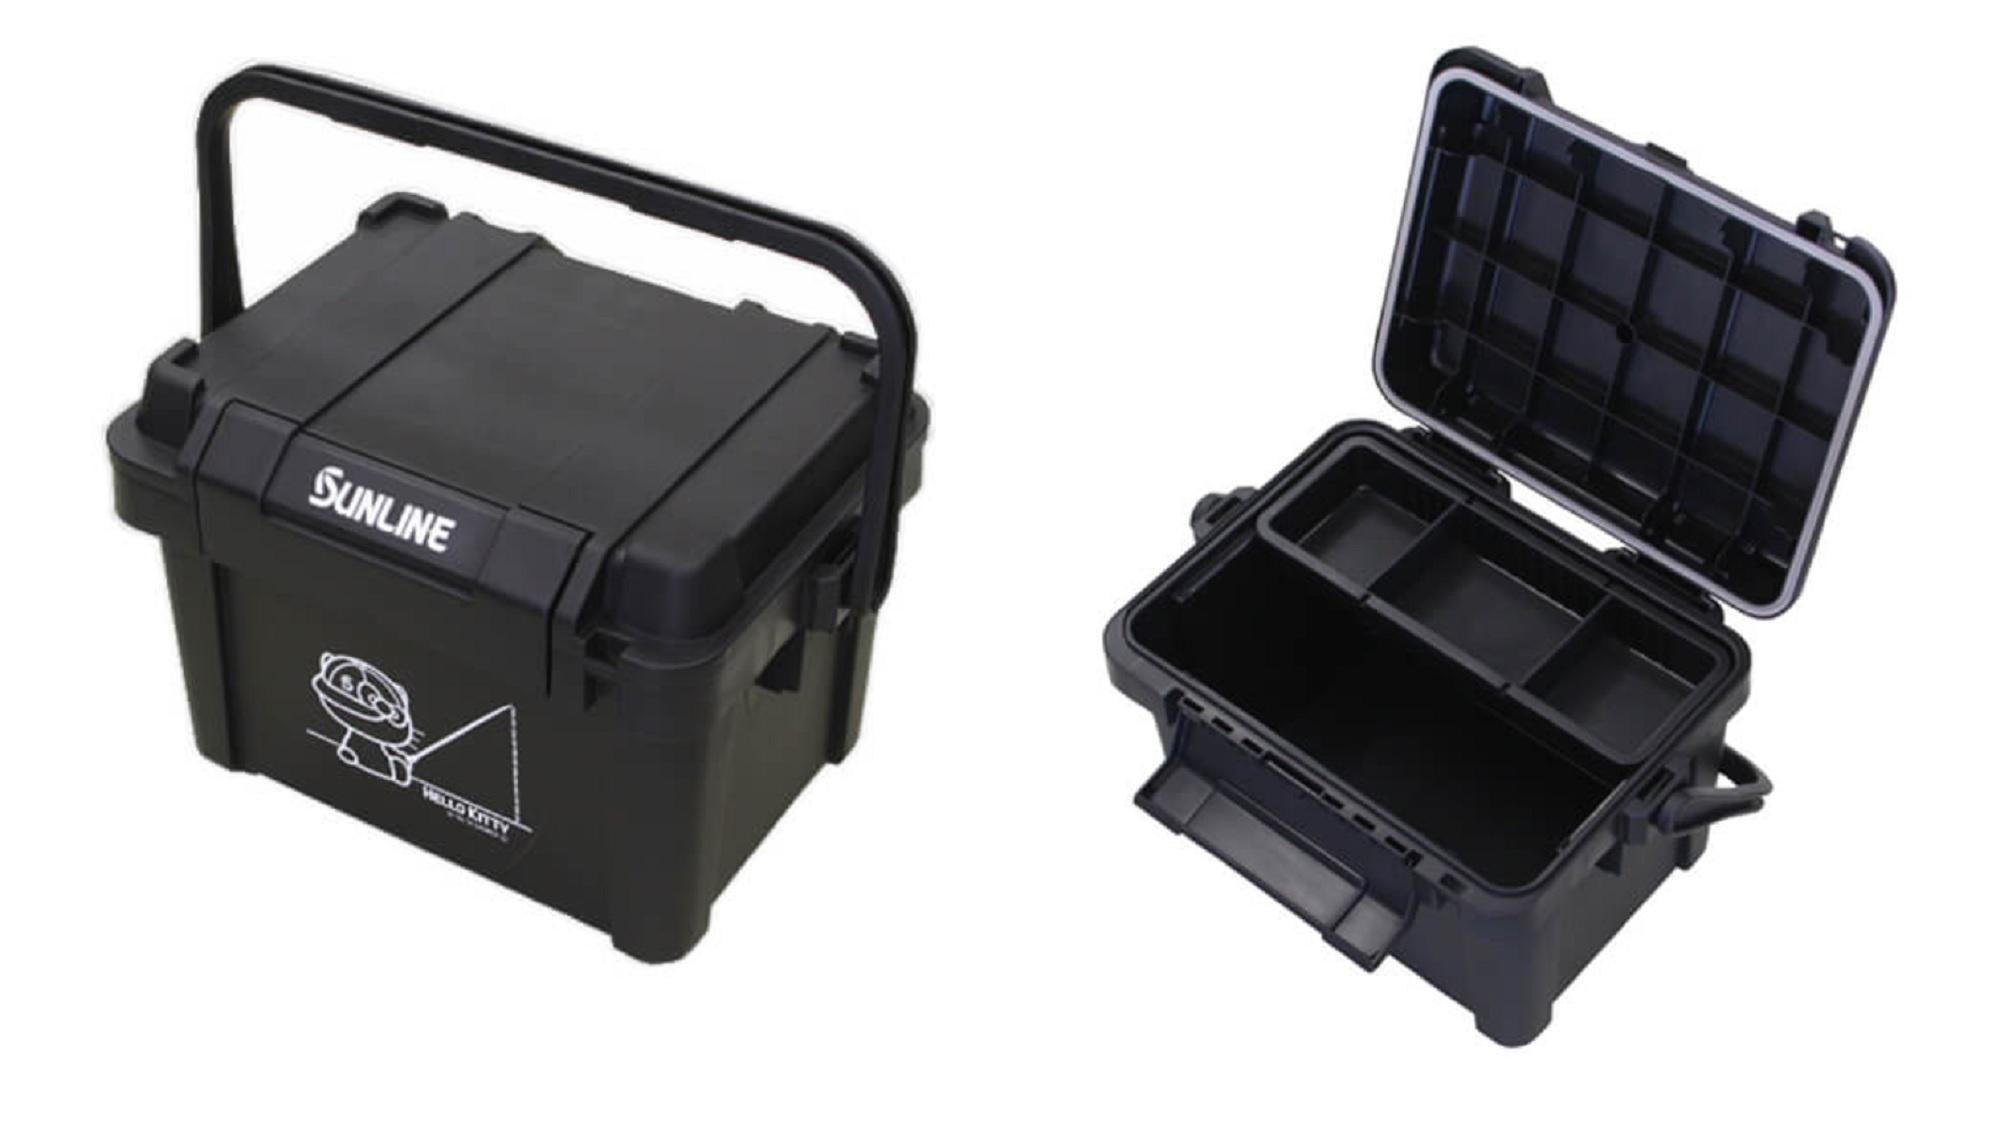 Sunline 21SK-04 Storage Box Hello Kitty 518 x 360 x 345mm Black (4733)